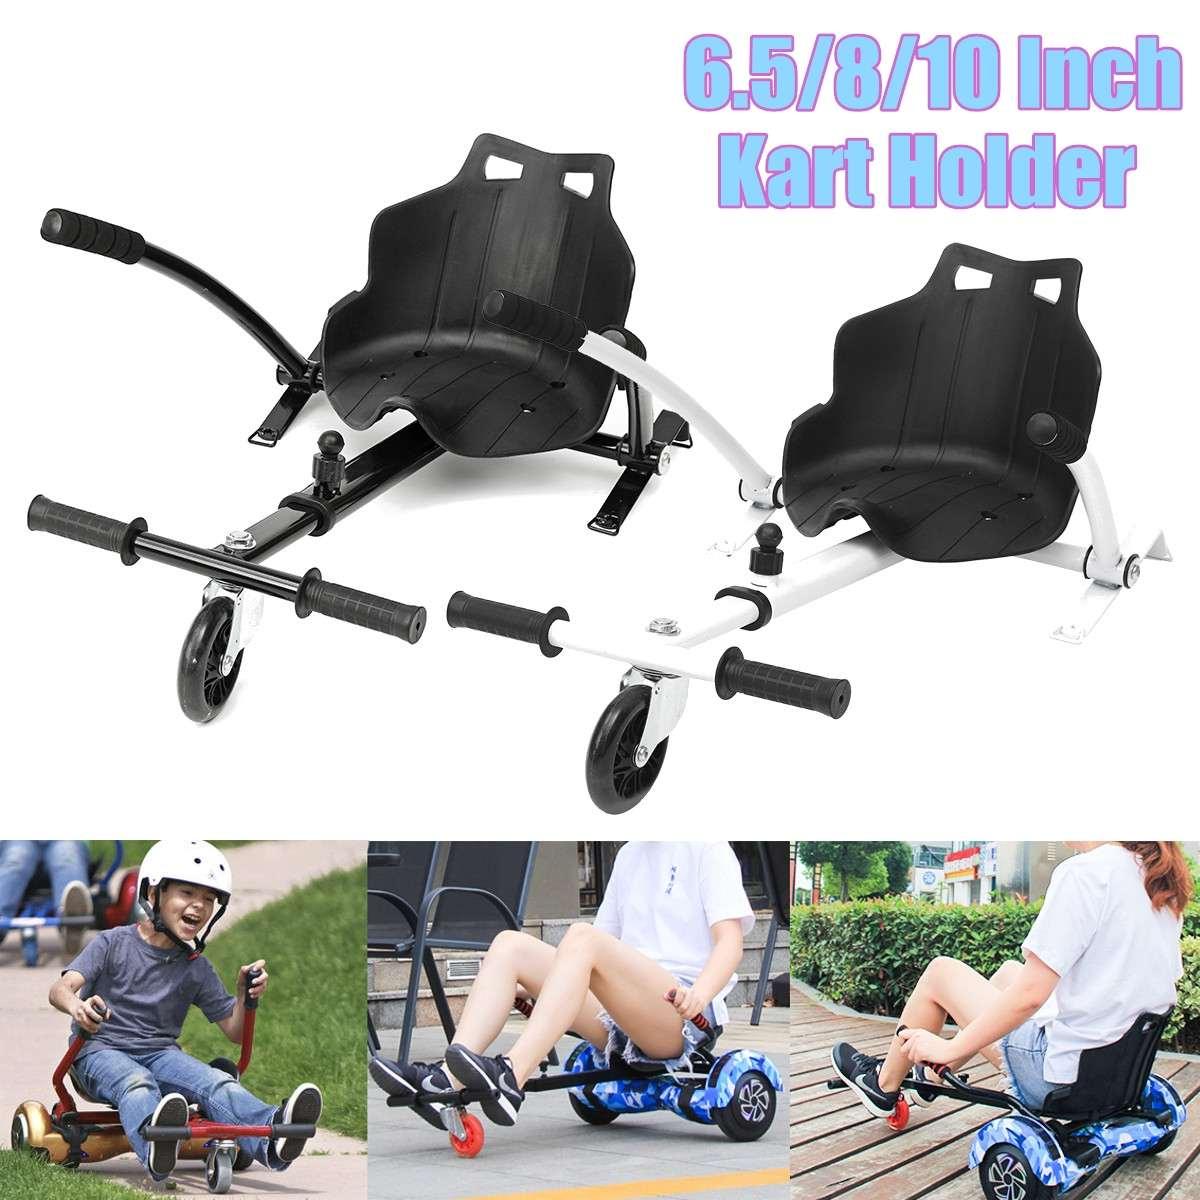 Universel Hoverboard Go Kart Hover chariot support siège support pour 6.5